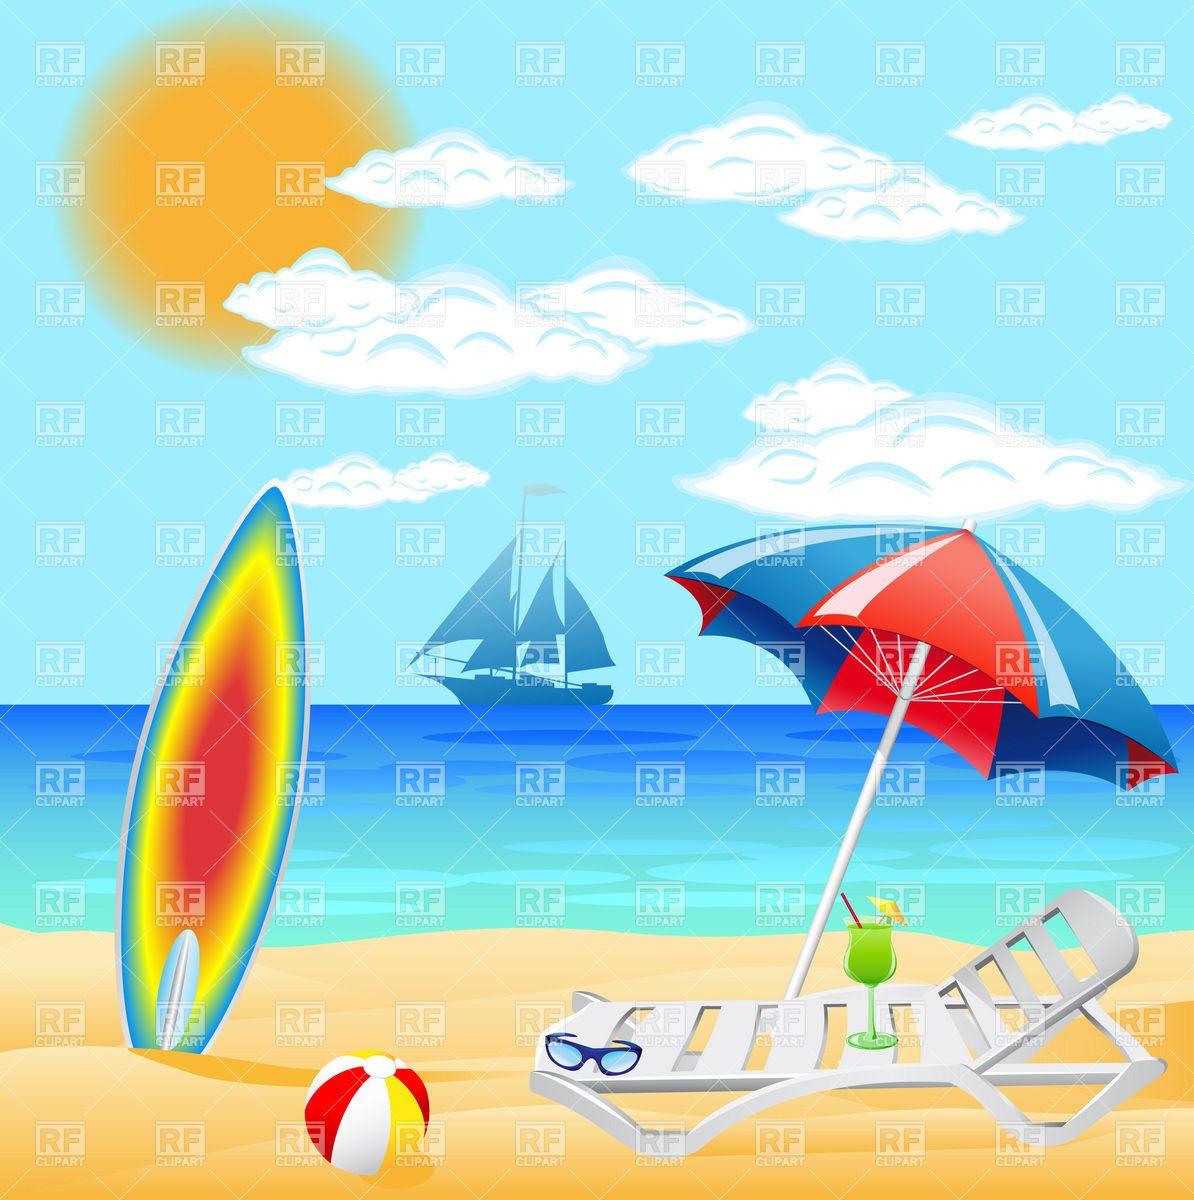 beach vacation clip art pics photos summer vacation clip art rh pinterest com Funny Vacation Clip Art vacation clipart images